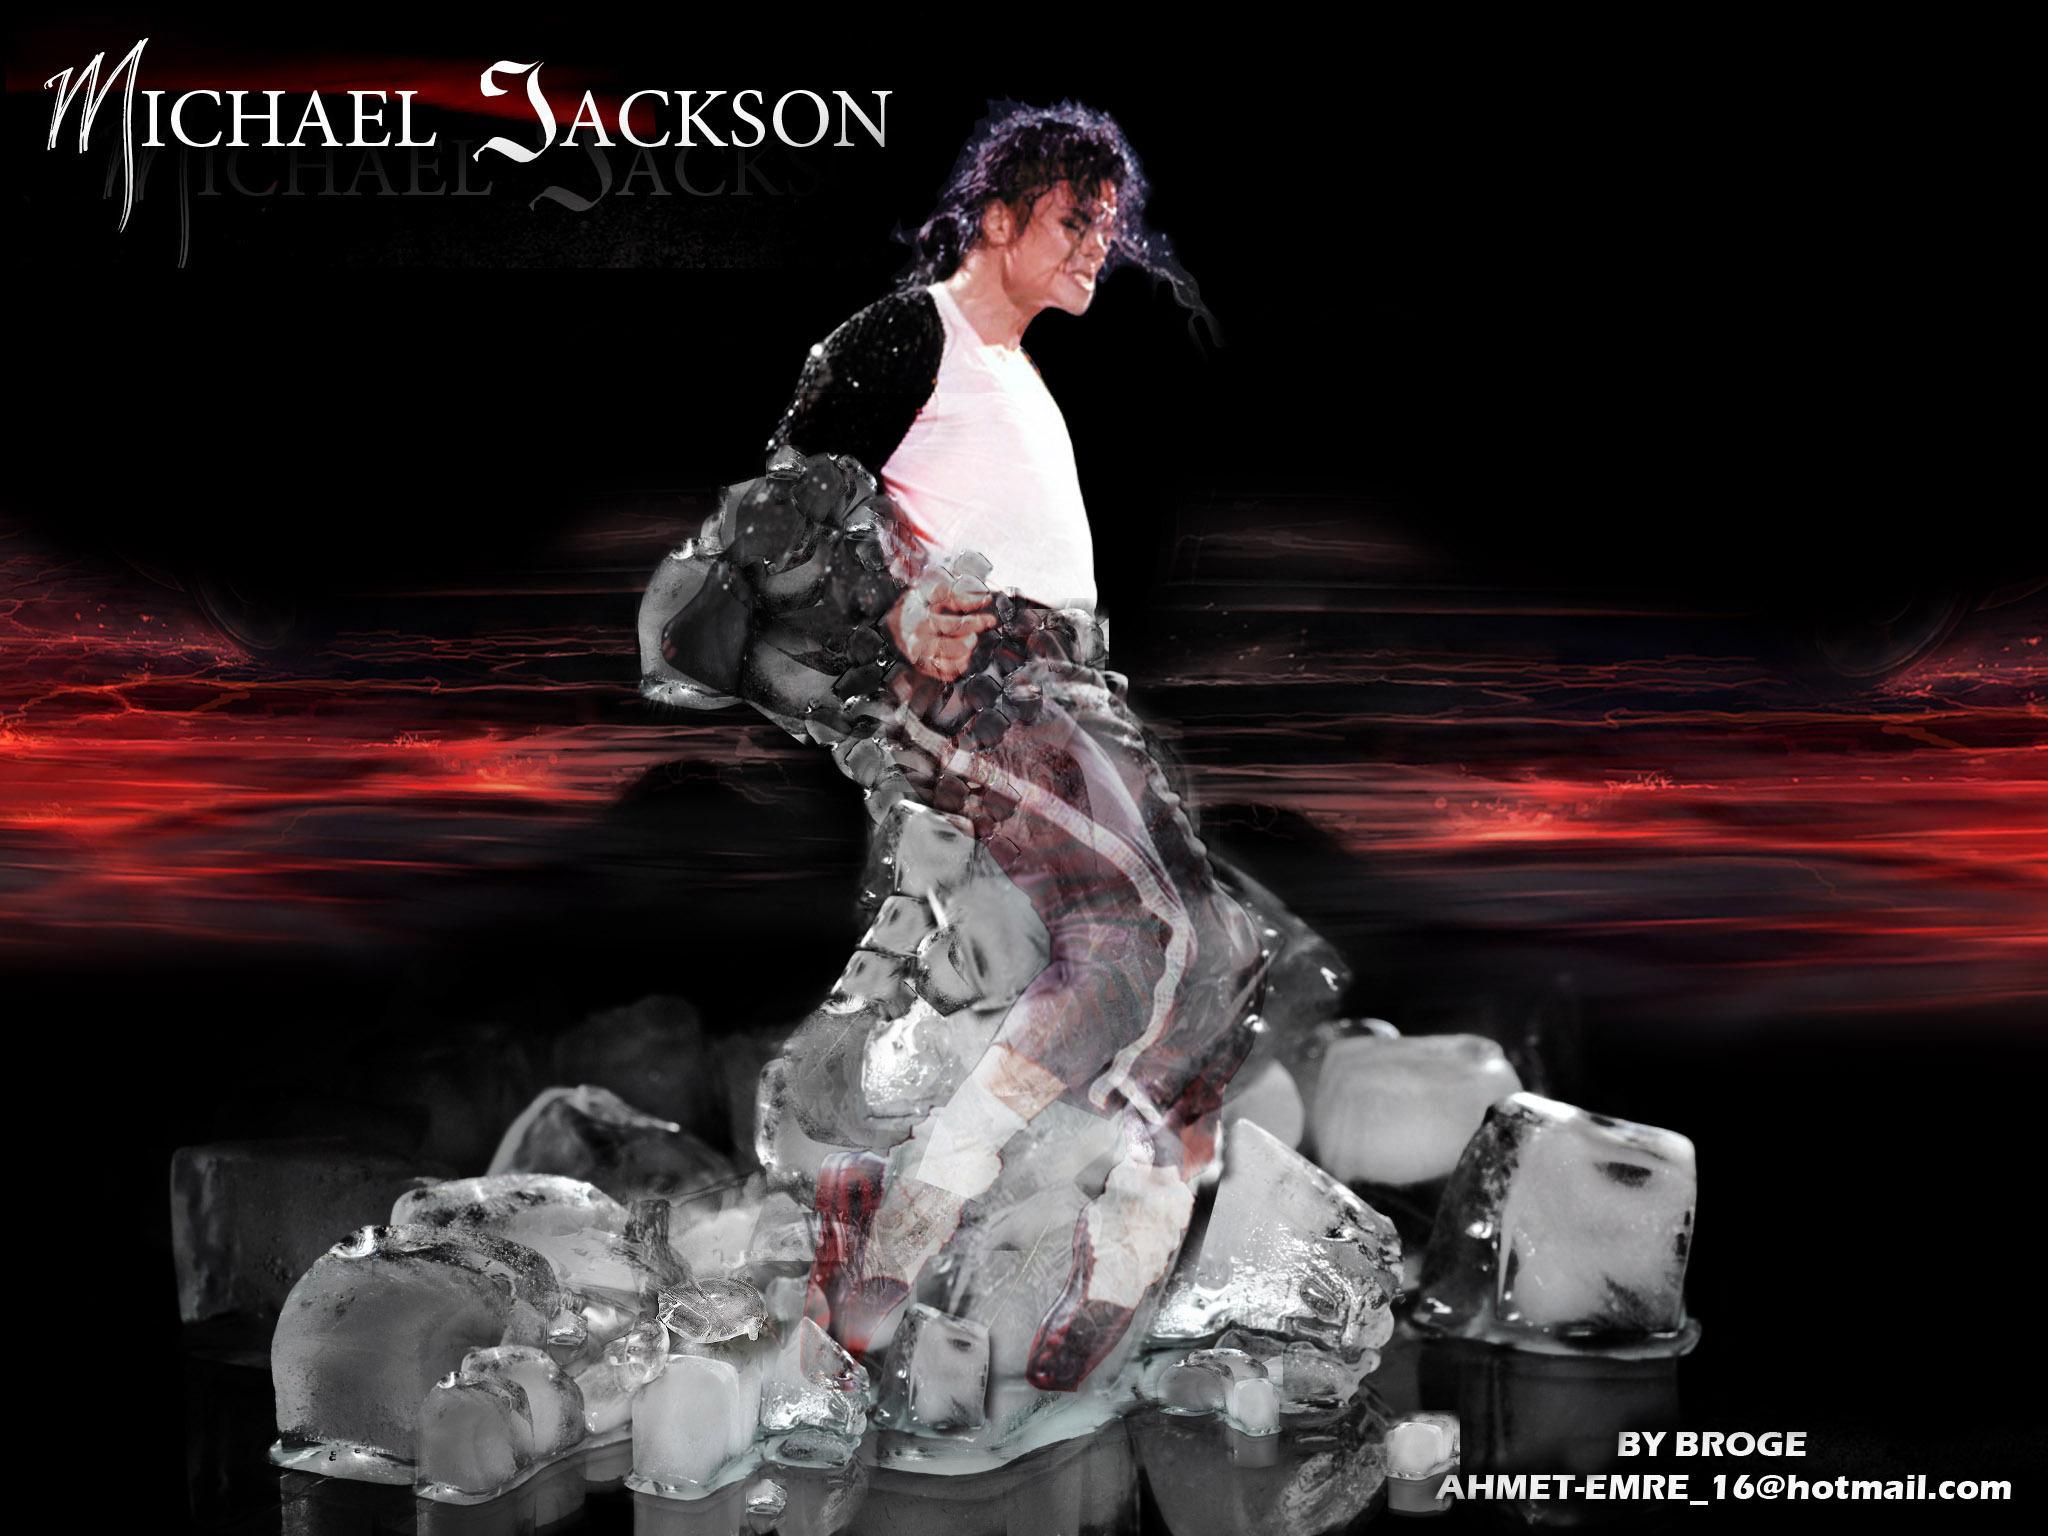 michael jackson - michael-jackson wallpaper